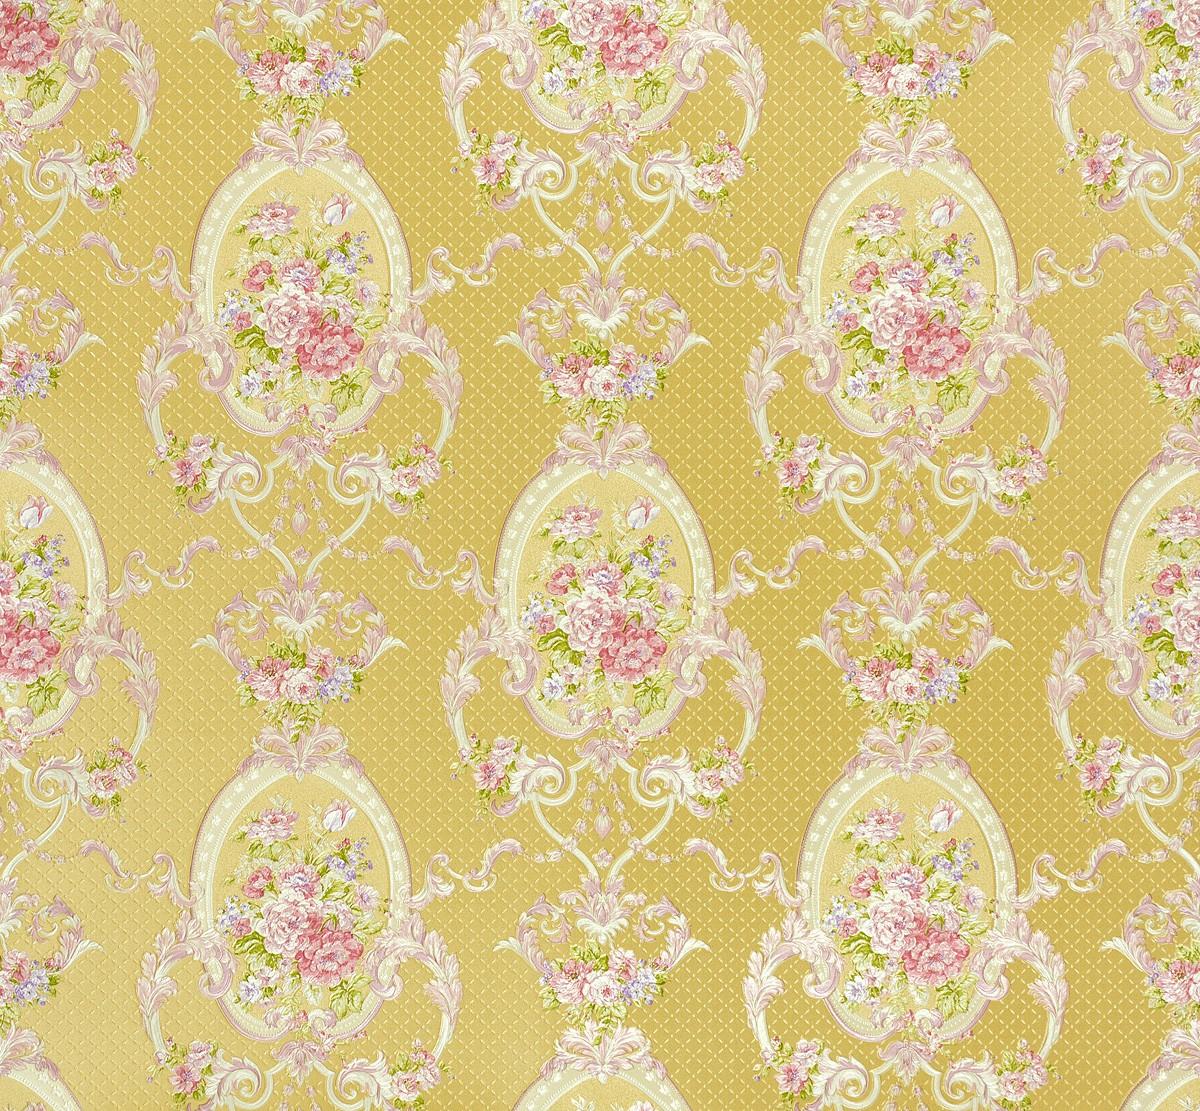 tapete chateau 4 as cr ation satintapete 95505 5 barock. Black Bedroom Furniture Sets. Home Design Ideas